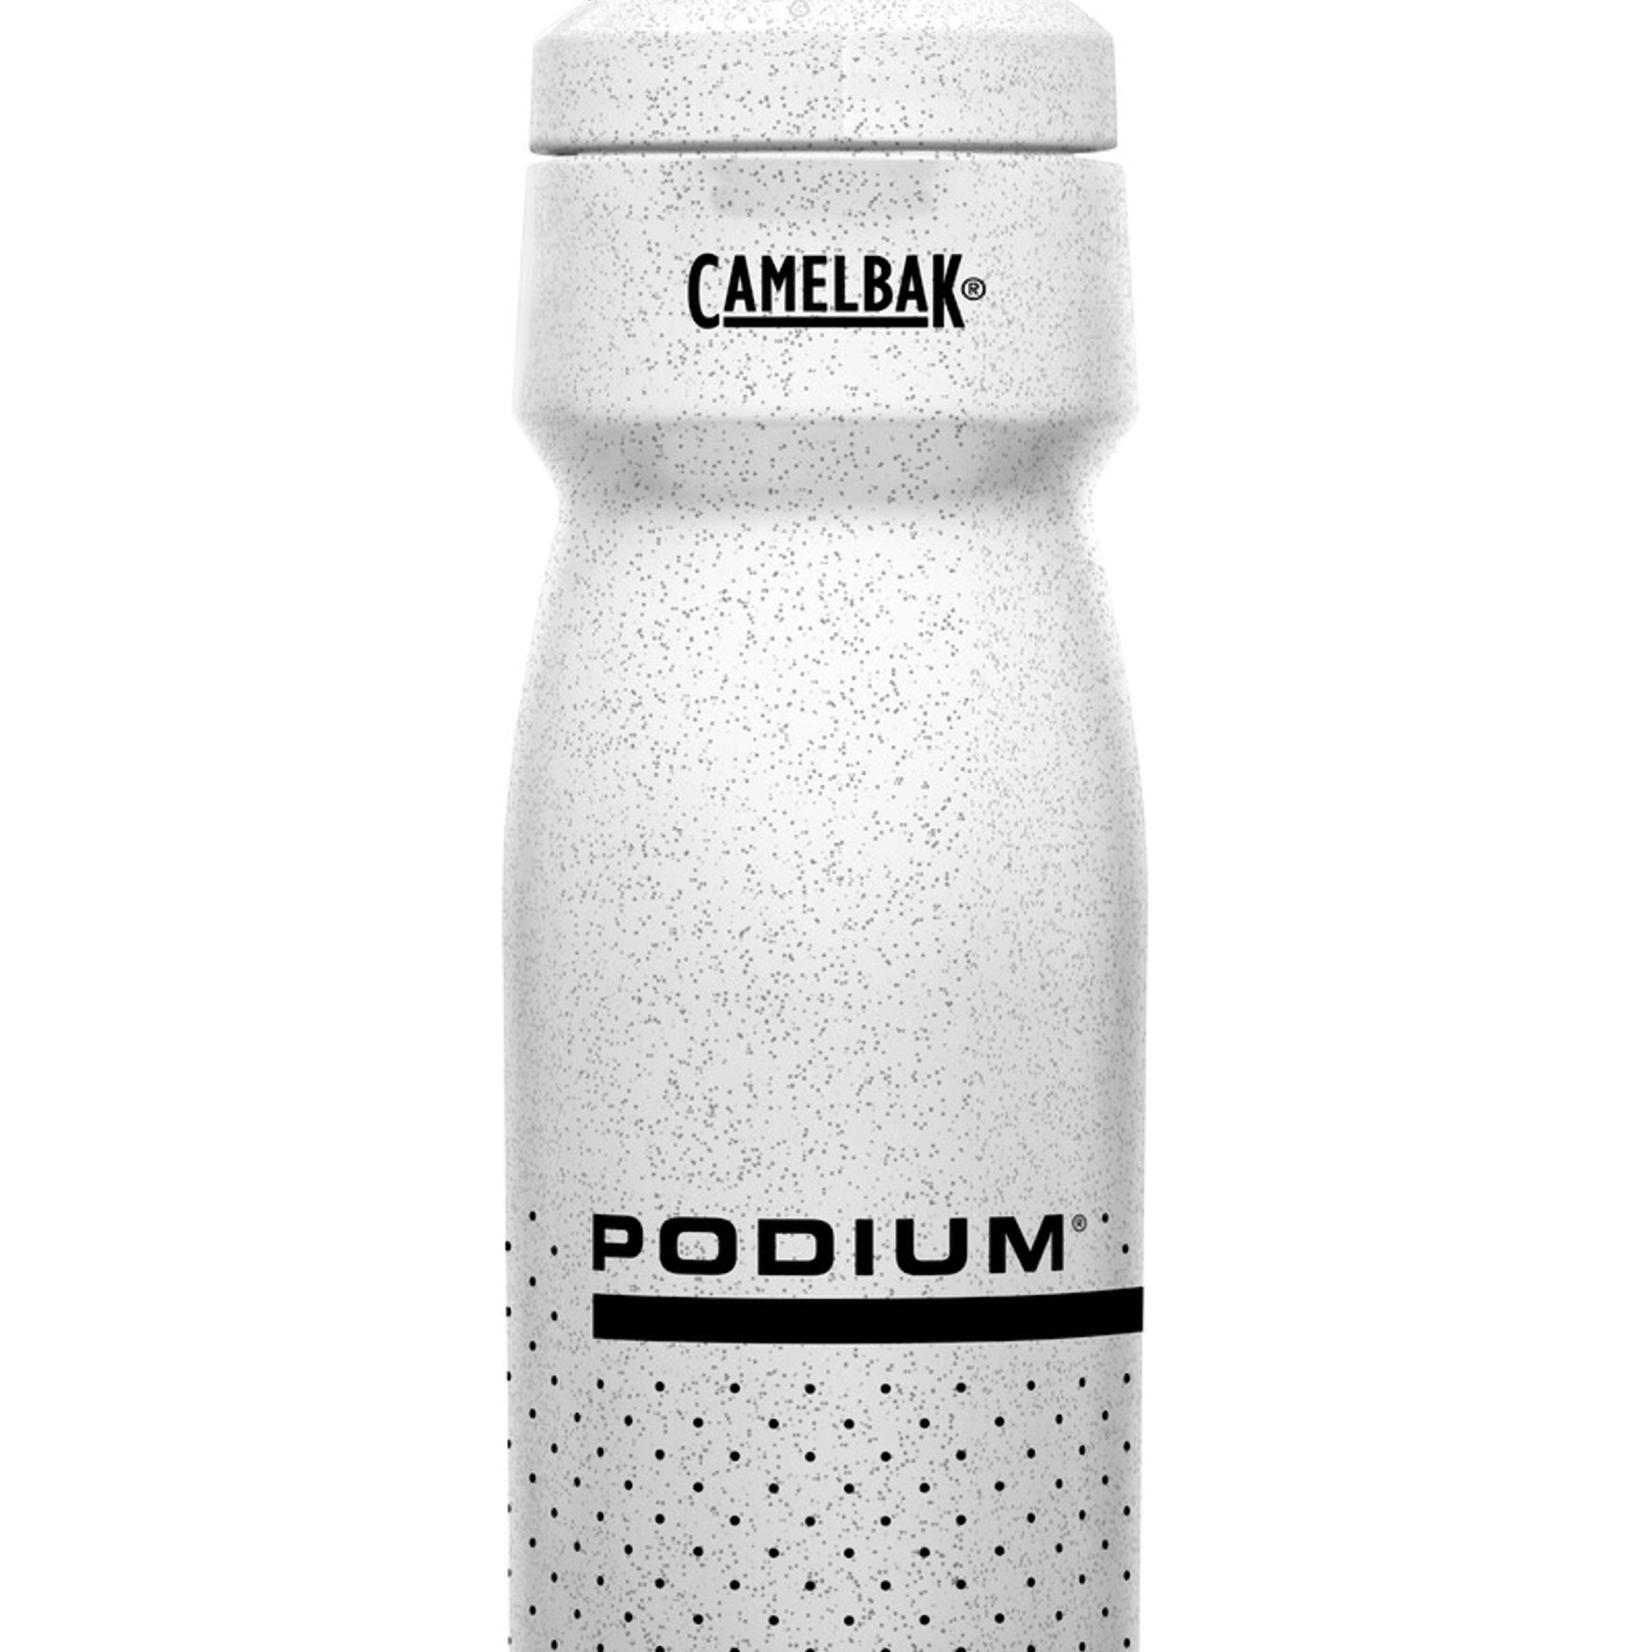 Camelbak PODIUM 24OZ WHITE SPECKLE